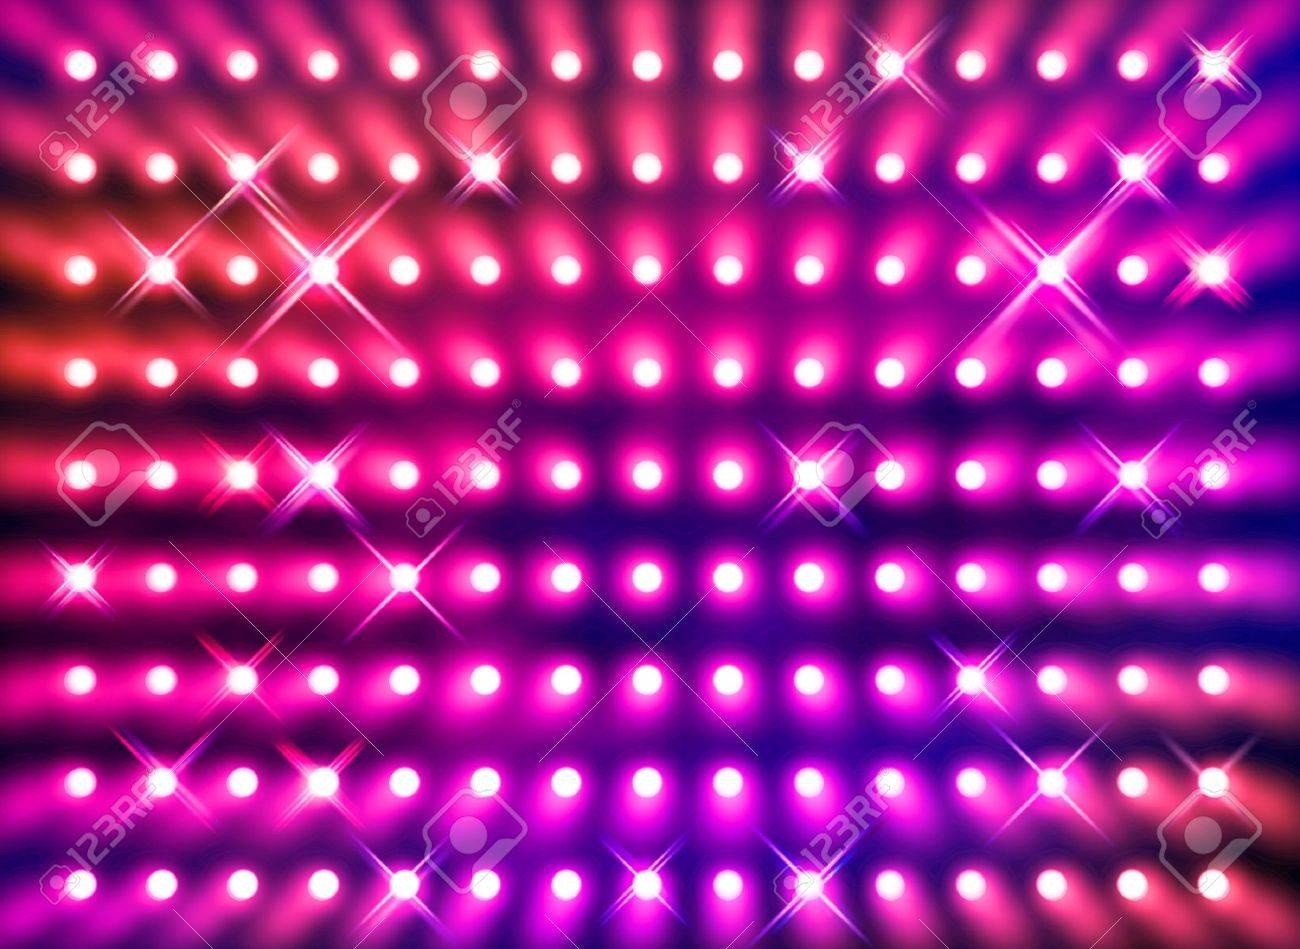 Premier stage presentation sparkling red spotlight wall background Stock Photo - 11094767